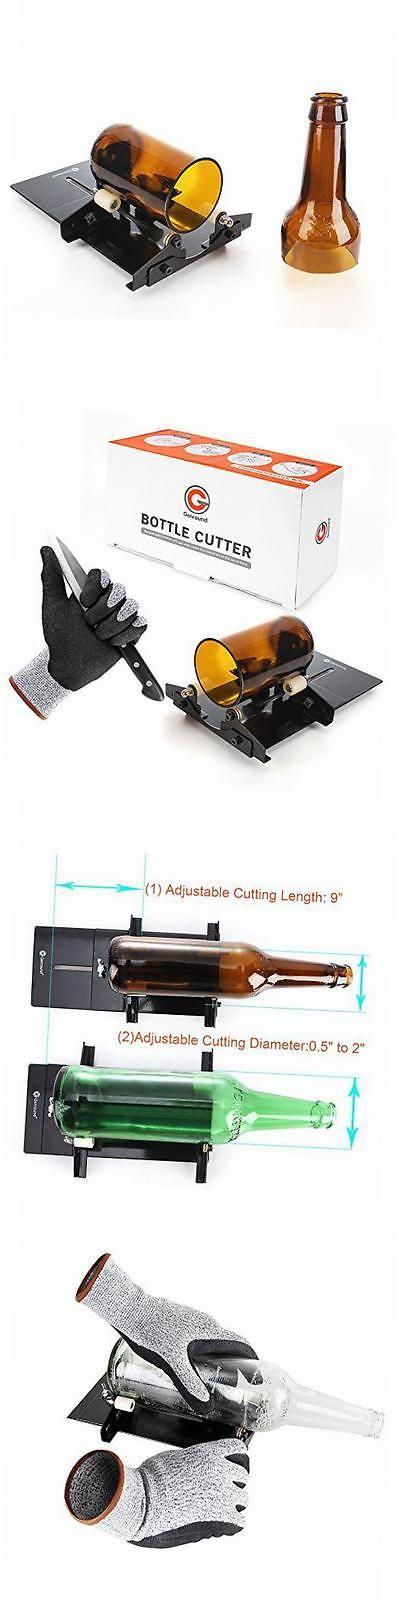 Glass Cutters 116643: Glass Bottle Cutter Etcher Cut Resistant Gloves Kit, Bottle Cutter Machine Wine -> BUY IT NOW ONLY: $41.69 on eBay!